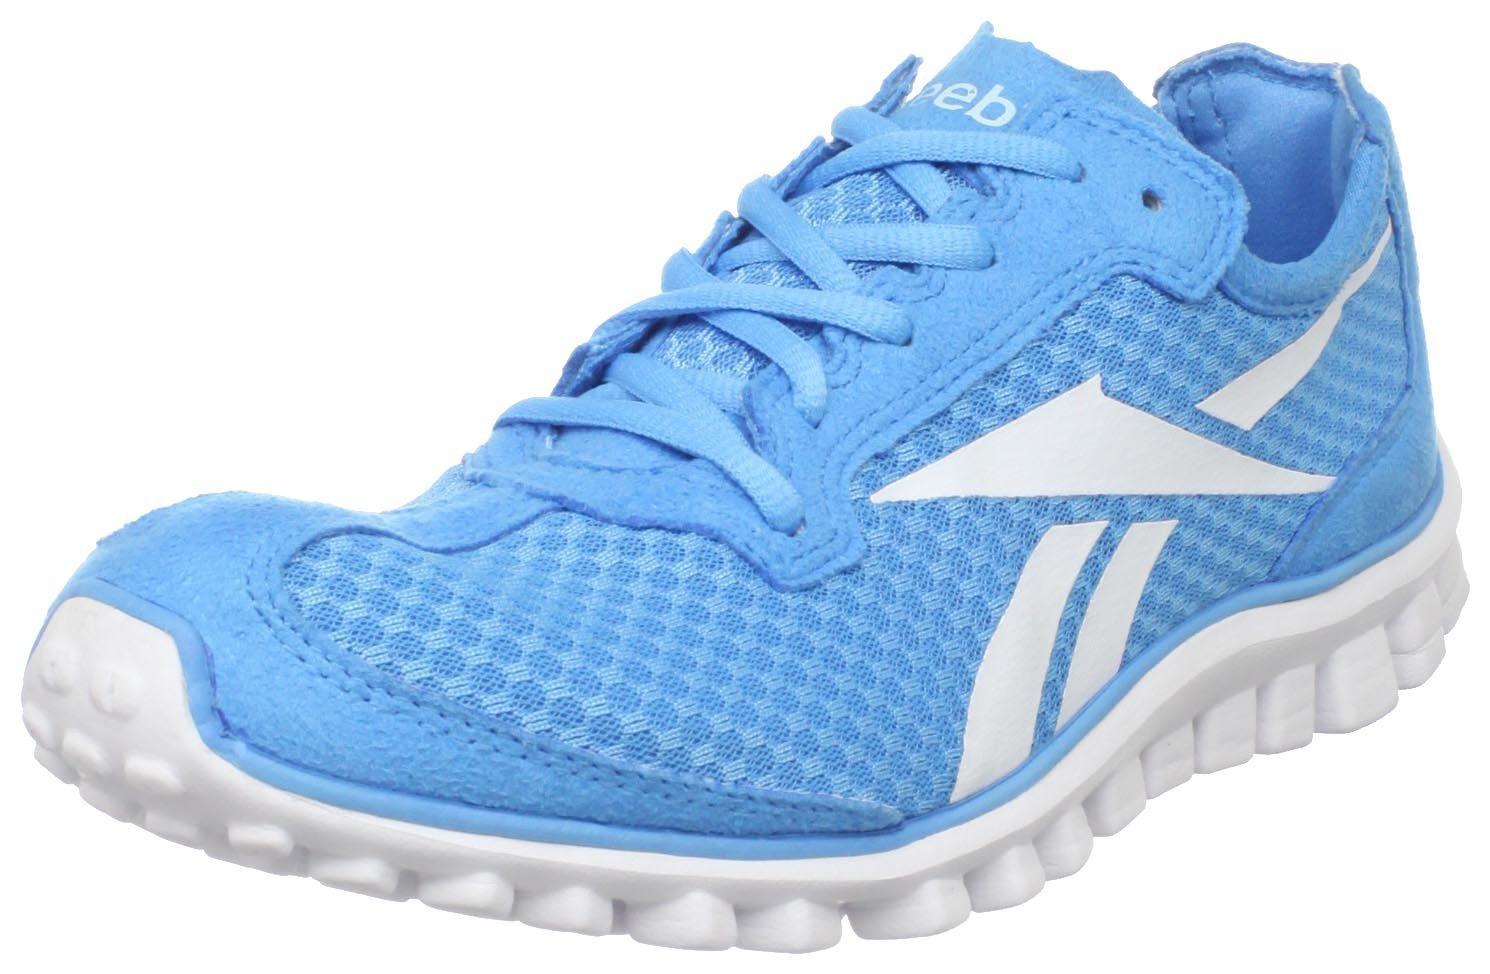 Reebok Womens Realflex Running Shoe in Blue (blue blink ...